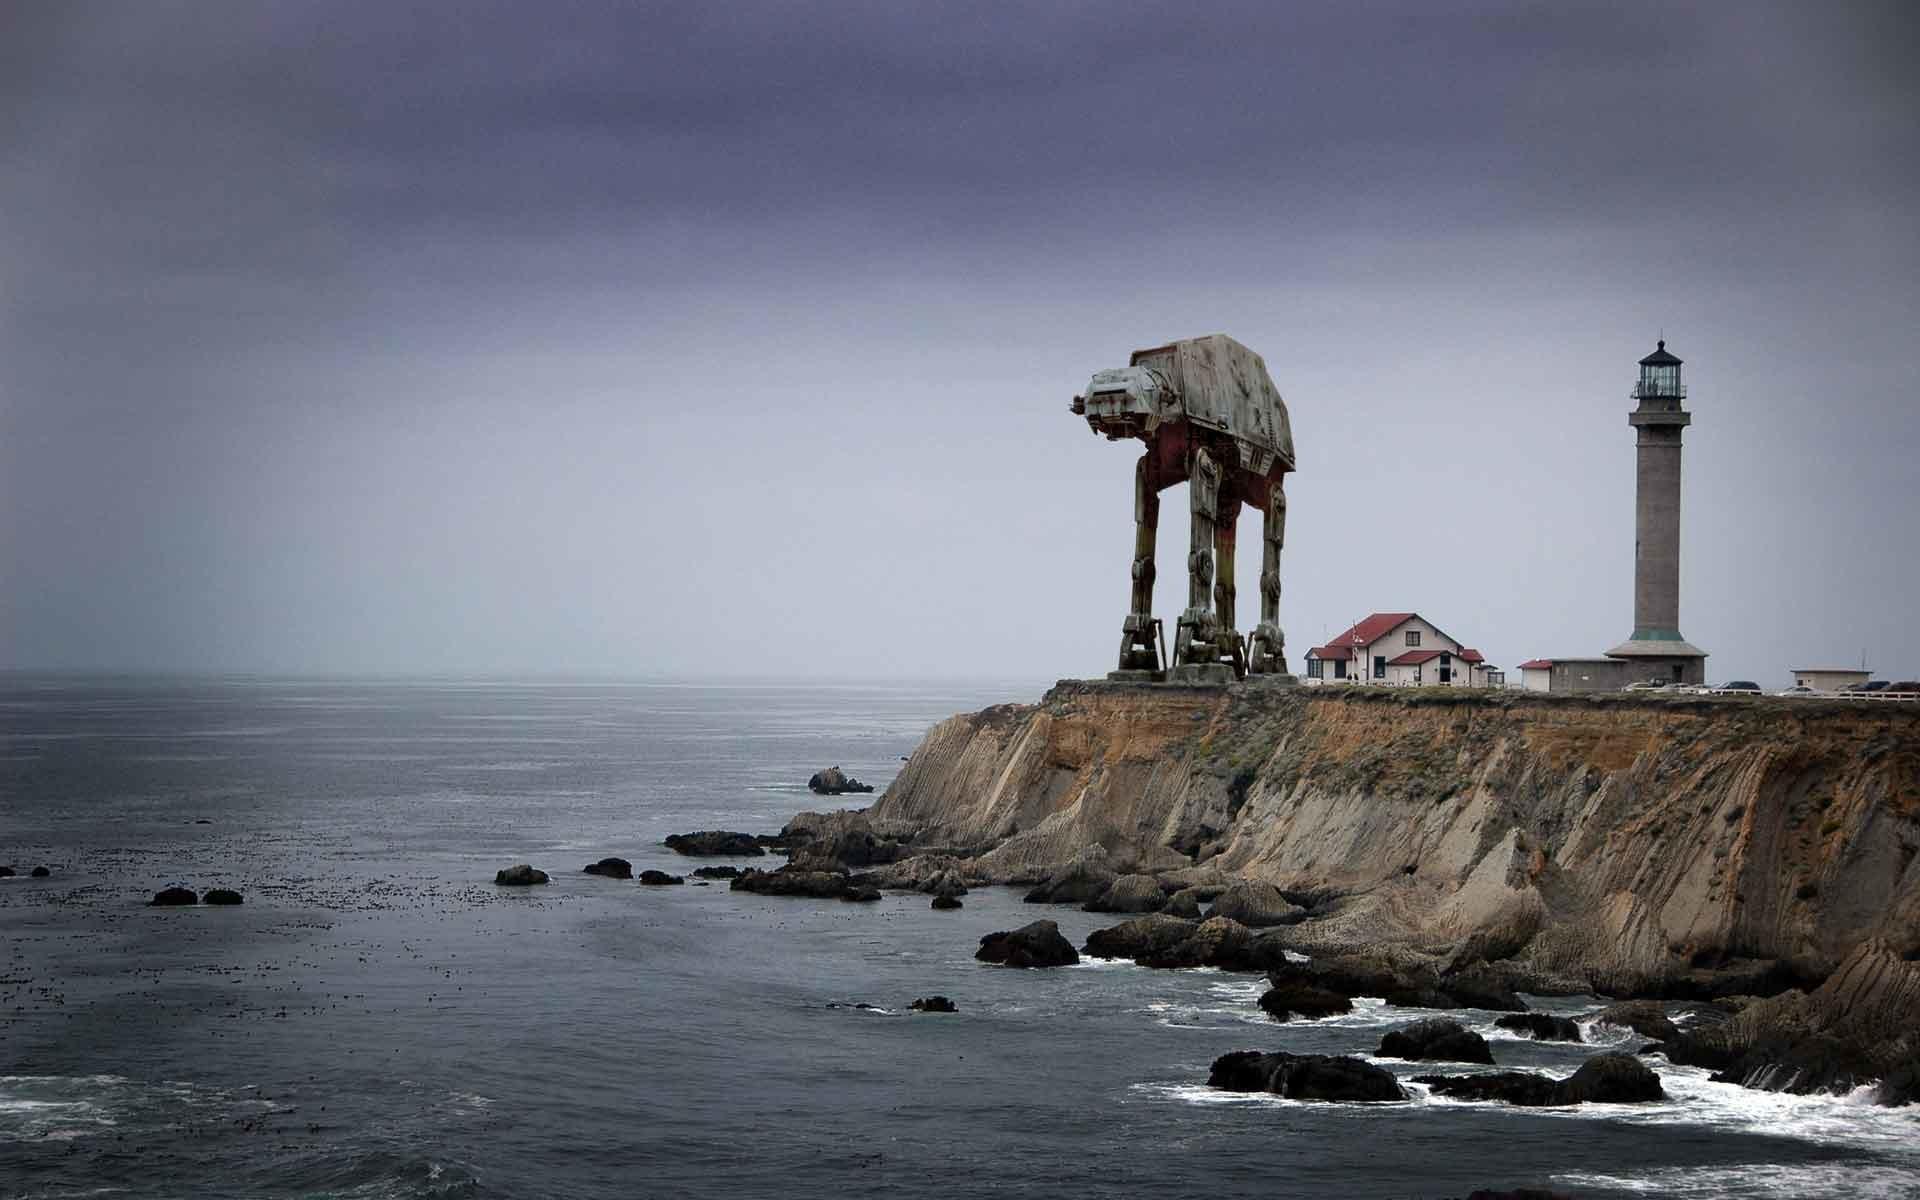 Cool War Robot Wallpaper High Quality Hd - Point Arena Lighthouse , HD Wallpaper & Backgrounds